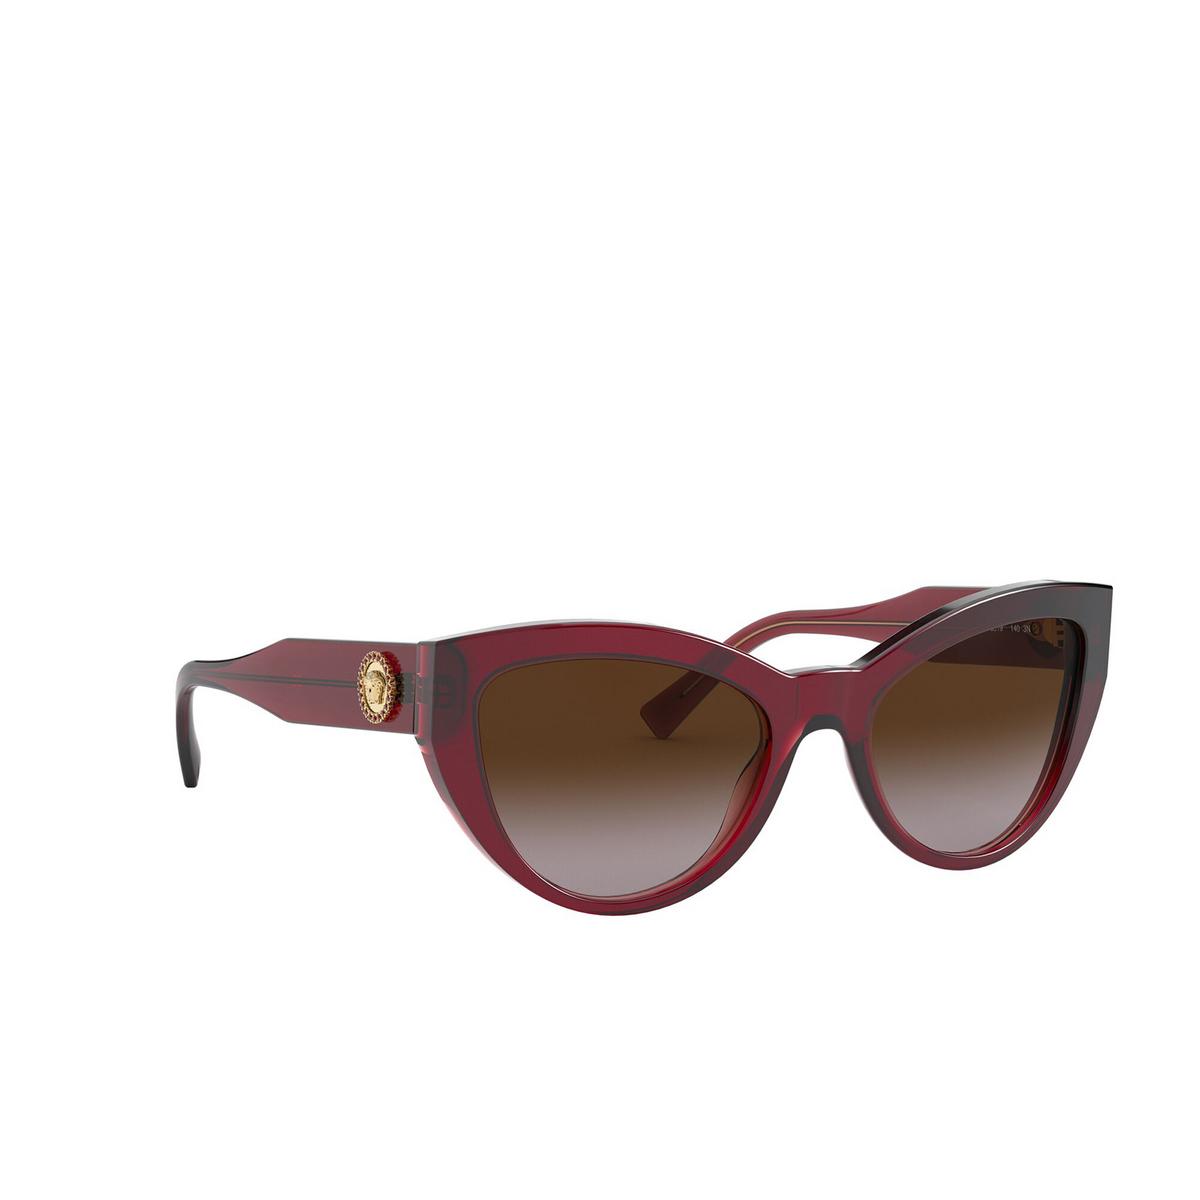 Versace® Cat-eye Sunglasses: VE4381B color Transparent Red 388/13 - three-quarters view.